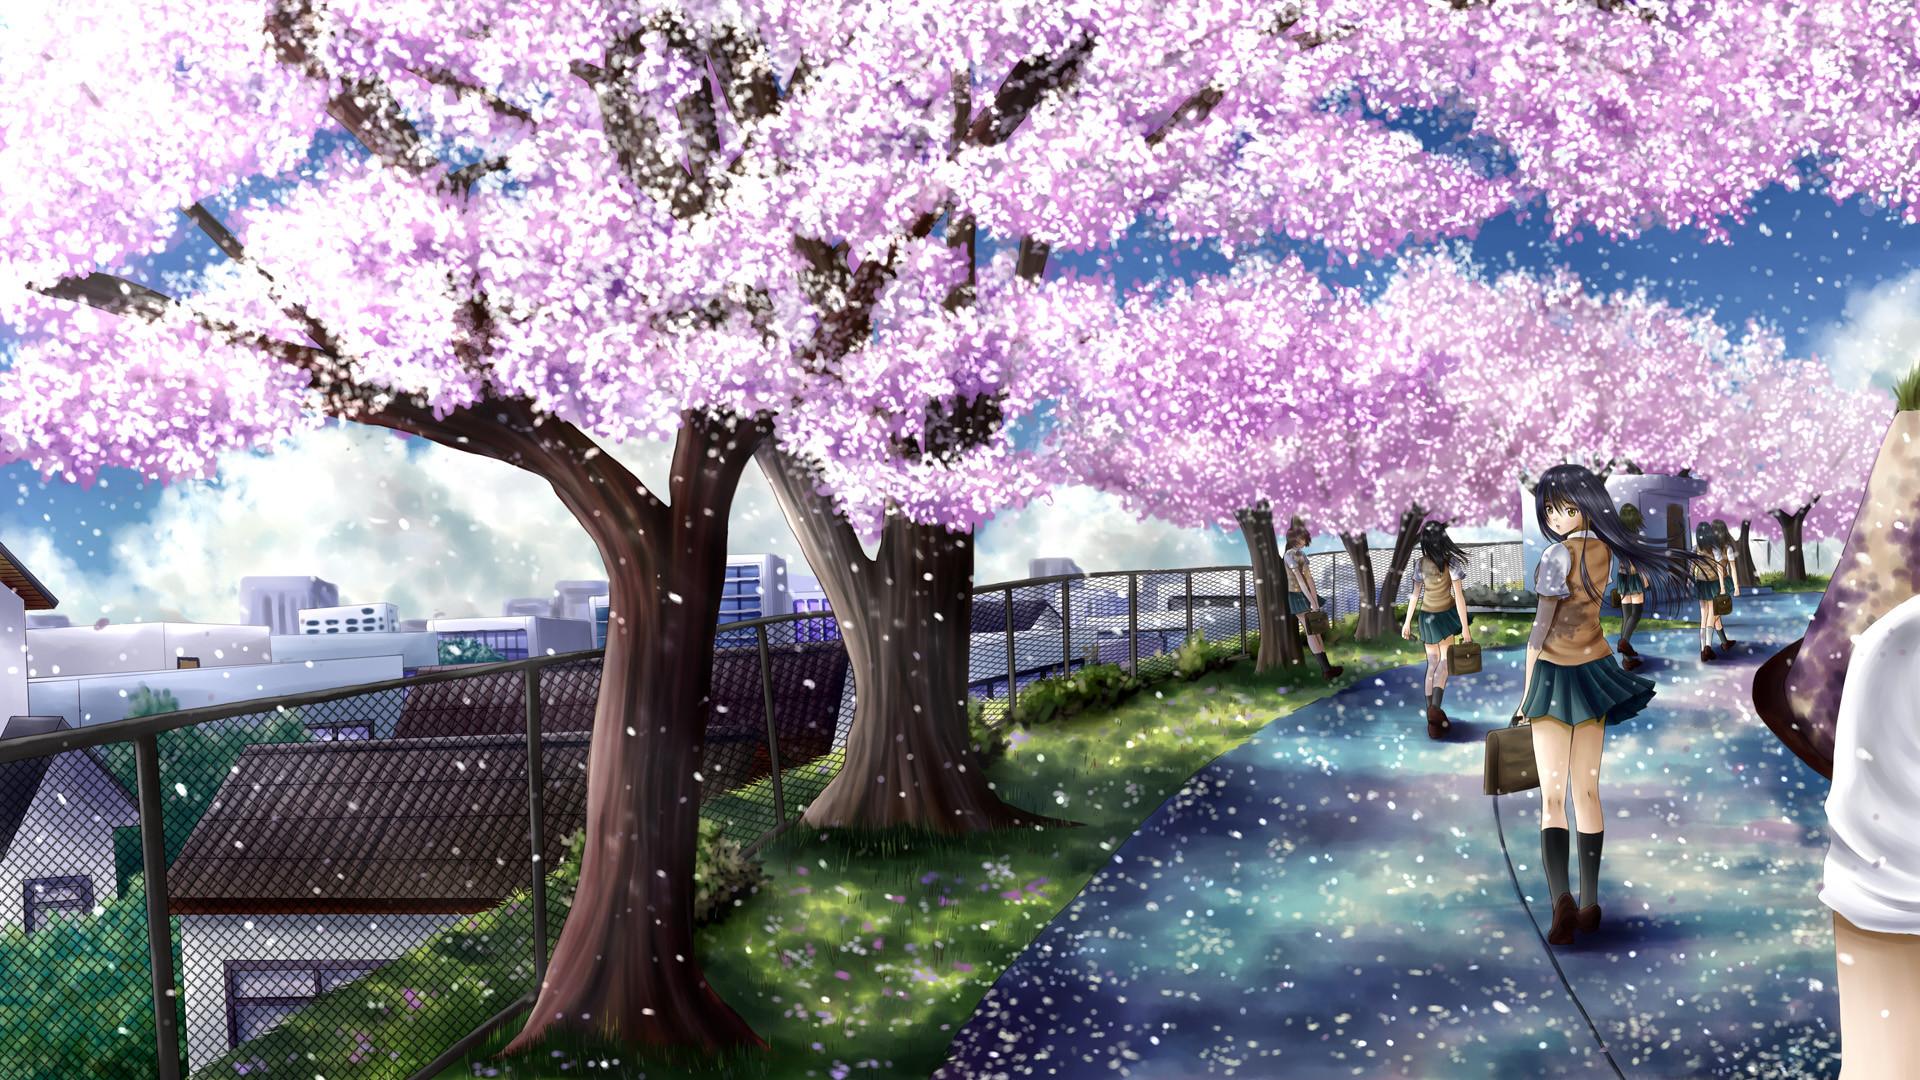 cherry blossoms, ilolamai, seifuku.jpg (1920×1080) | 1アニメ壁紙 | Pinterest | Cherry  blossoms, Anime art and Digital art